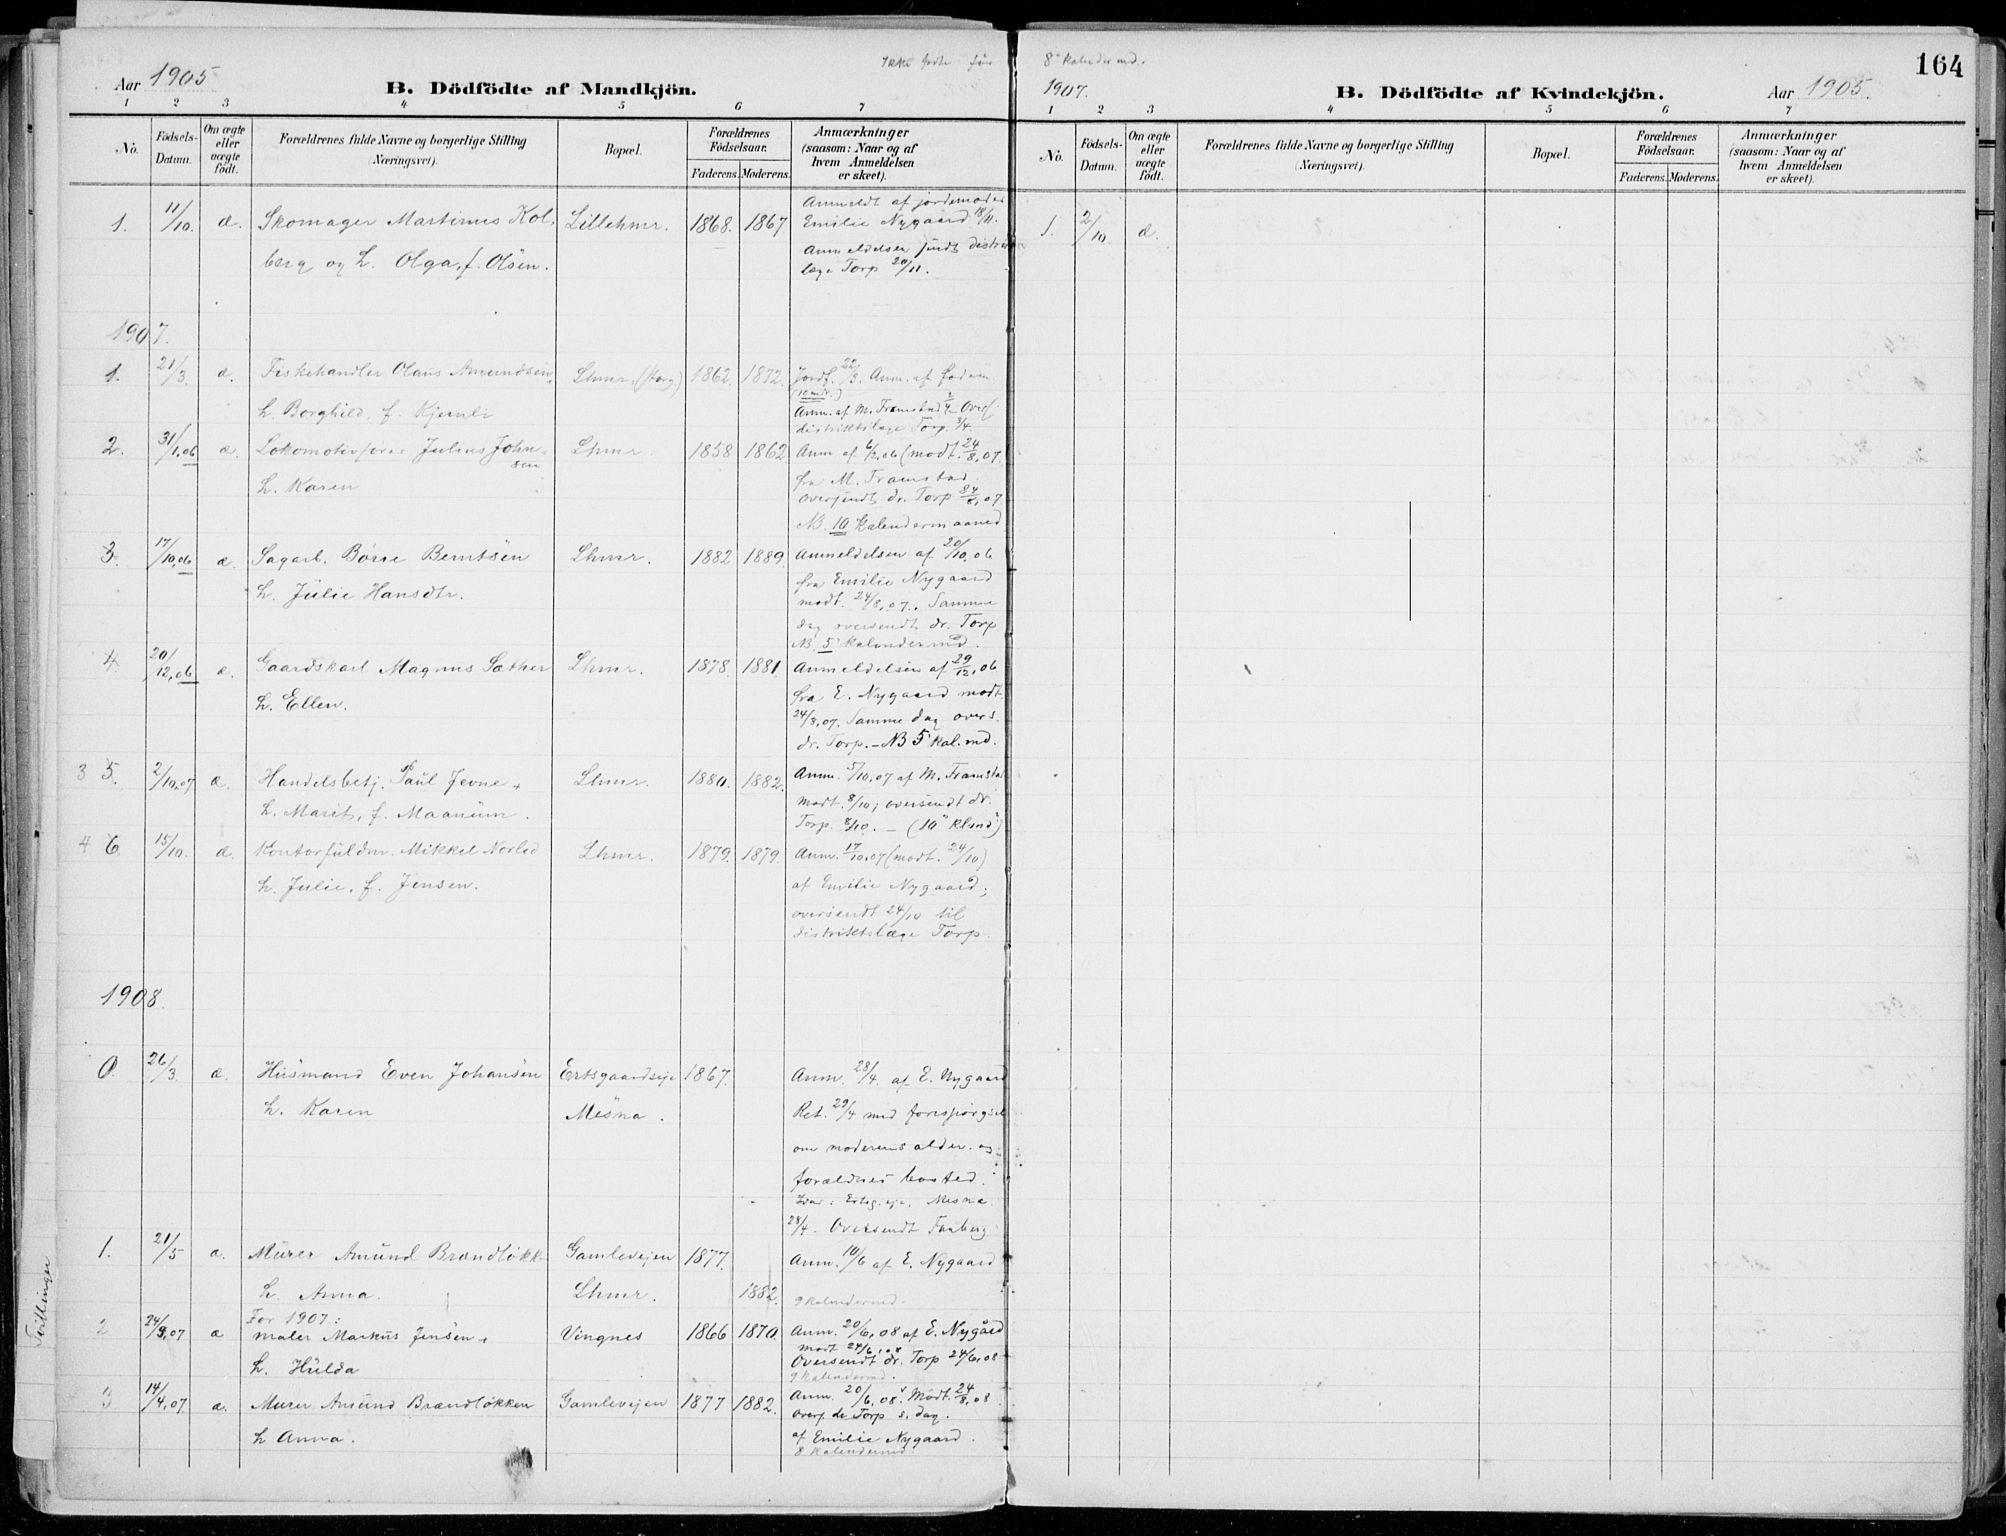 SAH, Lillehammer prestekontor, Ministerialbok nr. 1, 1901-1916, s. 164